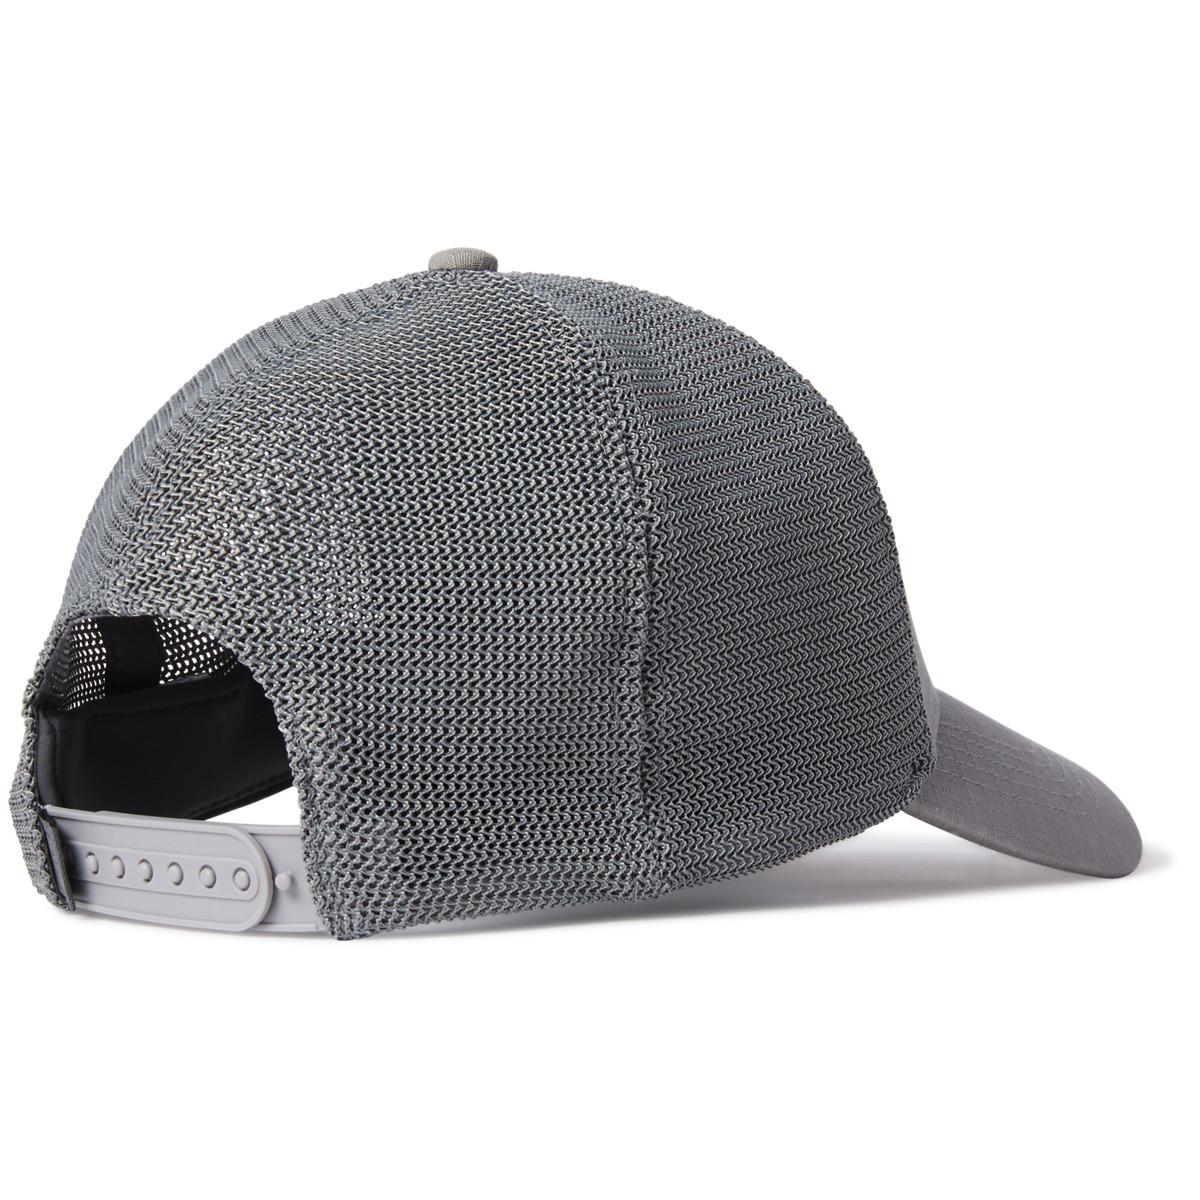 074f1857ce828 Danner - Danner Low Pro Trucker Hat Gray